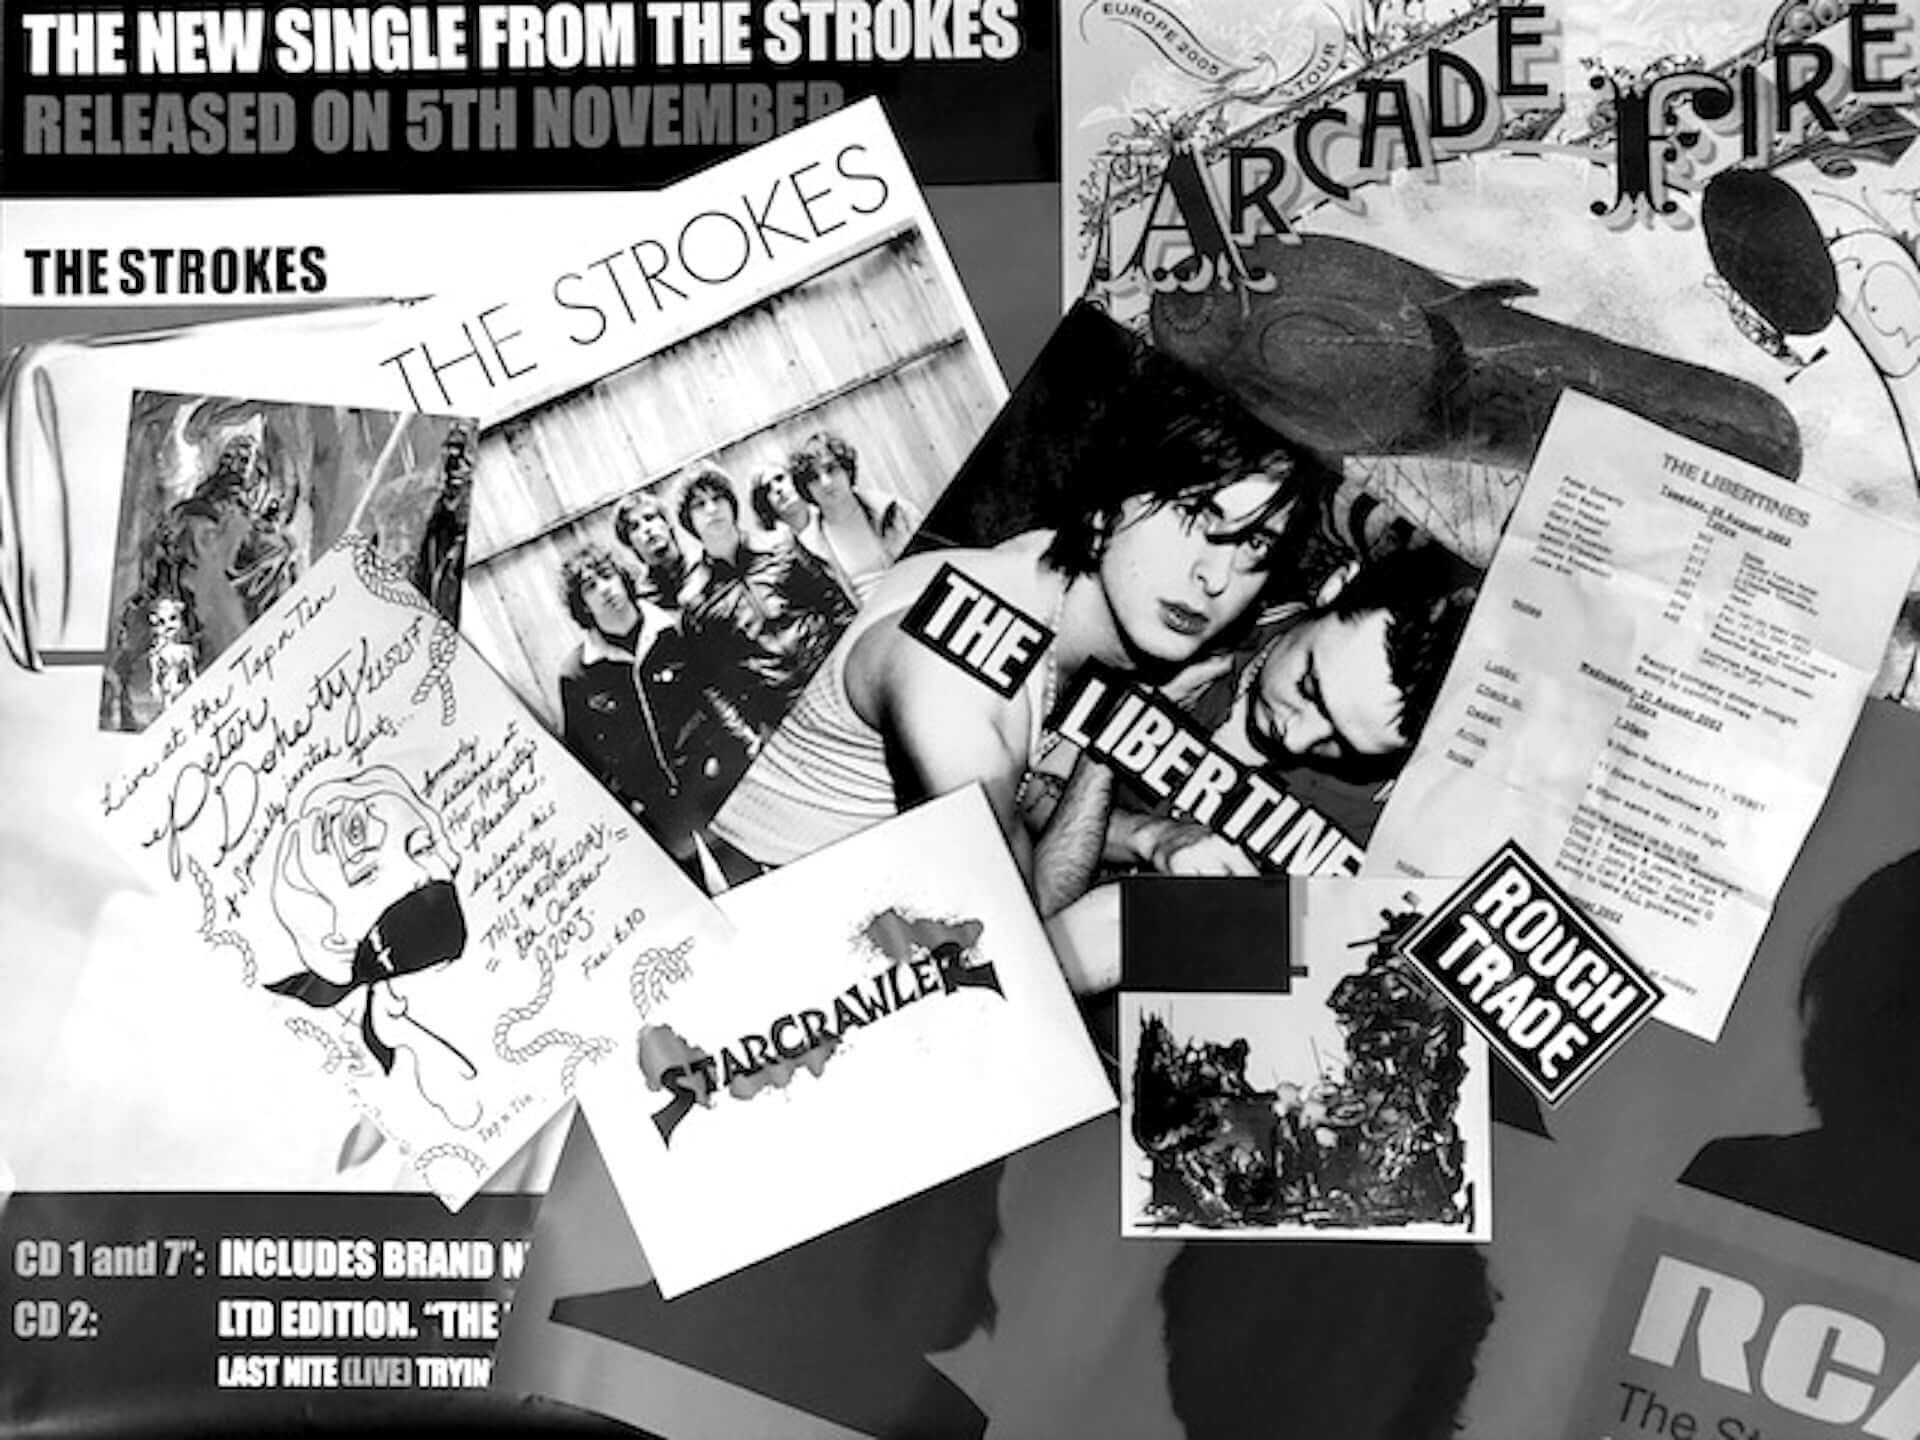 〈Rough Trade Records〉の特別展示が代官山蔦屋書店にて開催決定!ジェフ・トラヴィスが選んだ名盤など展示&新作グッズも販売 music201015_roughtrade-tsite_5-1920x1440